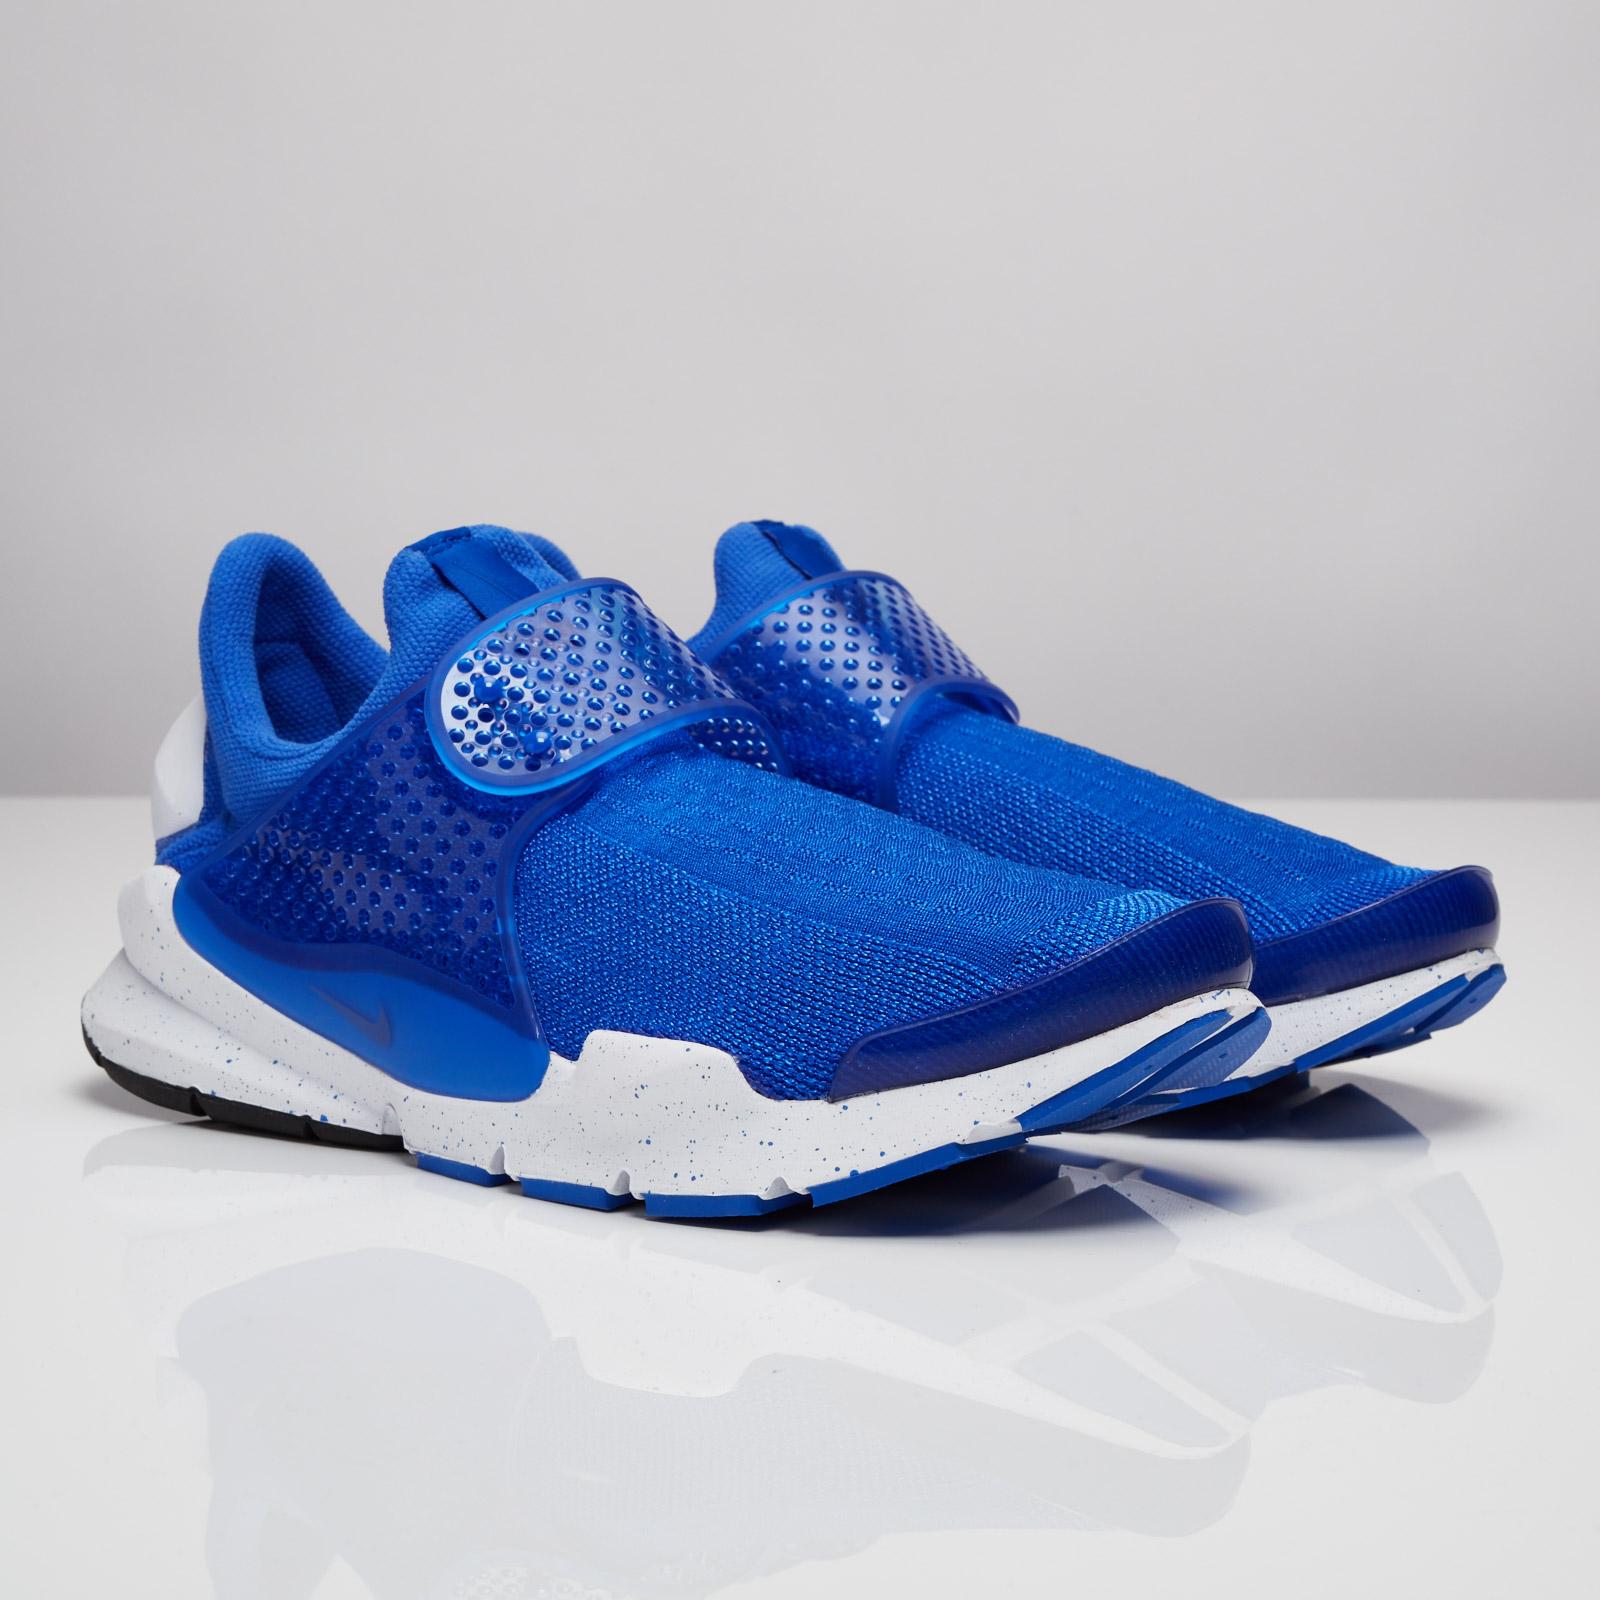 uk availability a4384 413c0 Nike Sock Dart SE - 833124-401 - Sneakersnstuff | sneakers ...